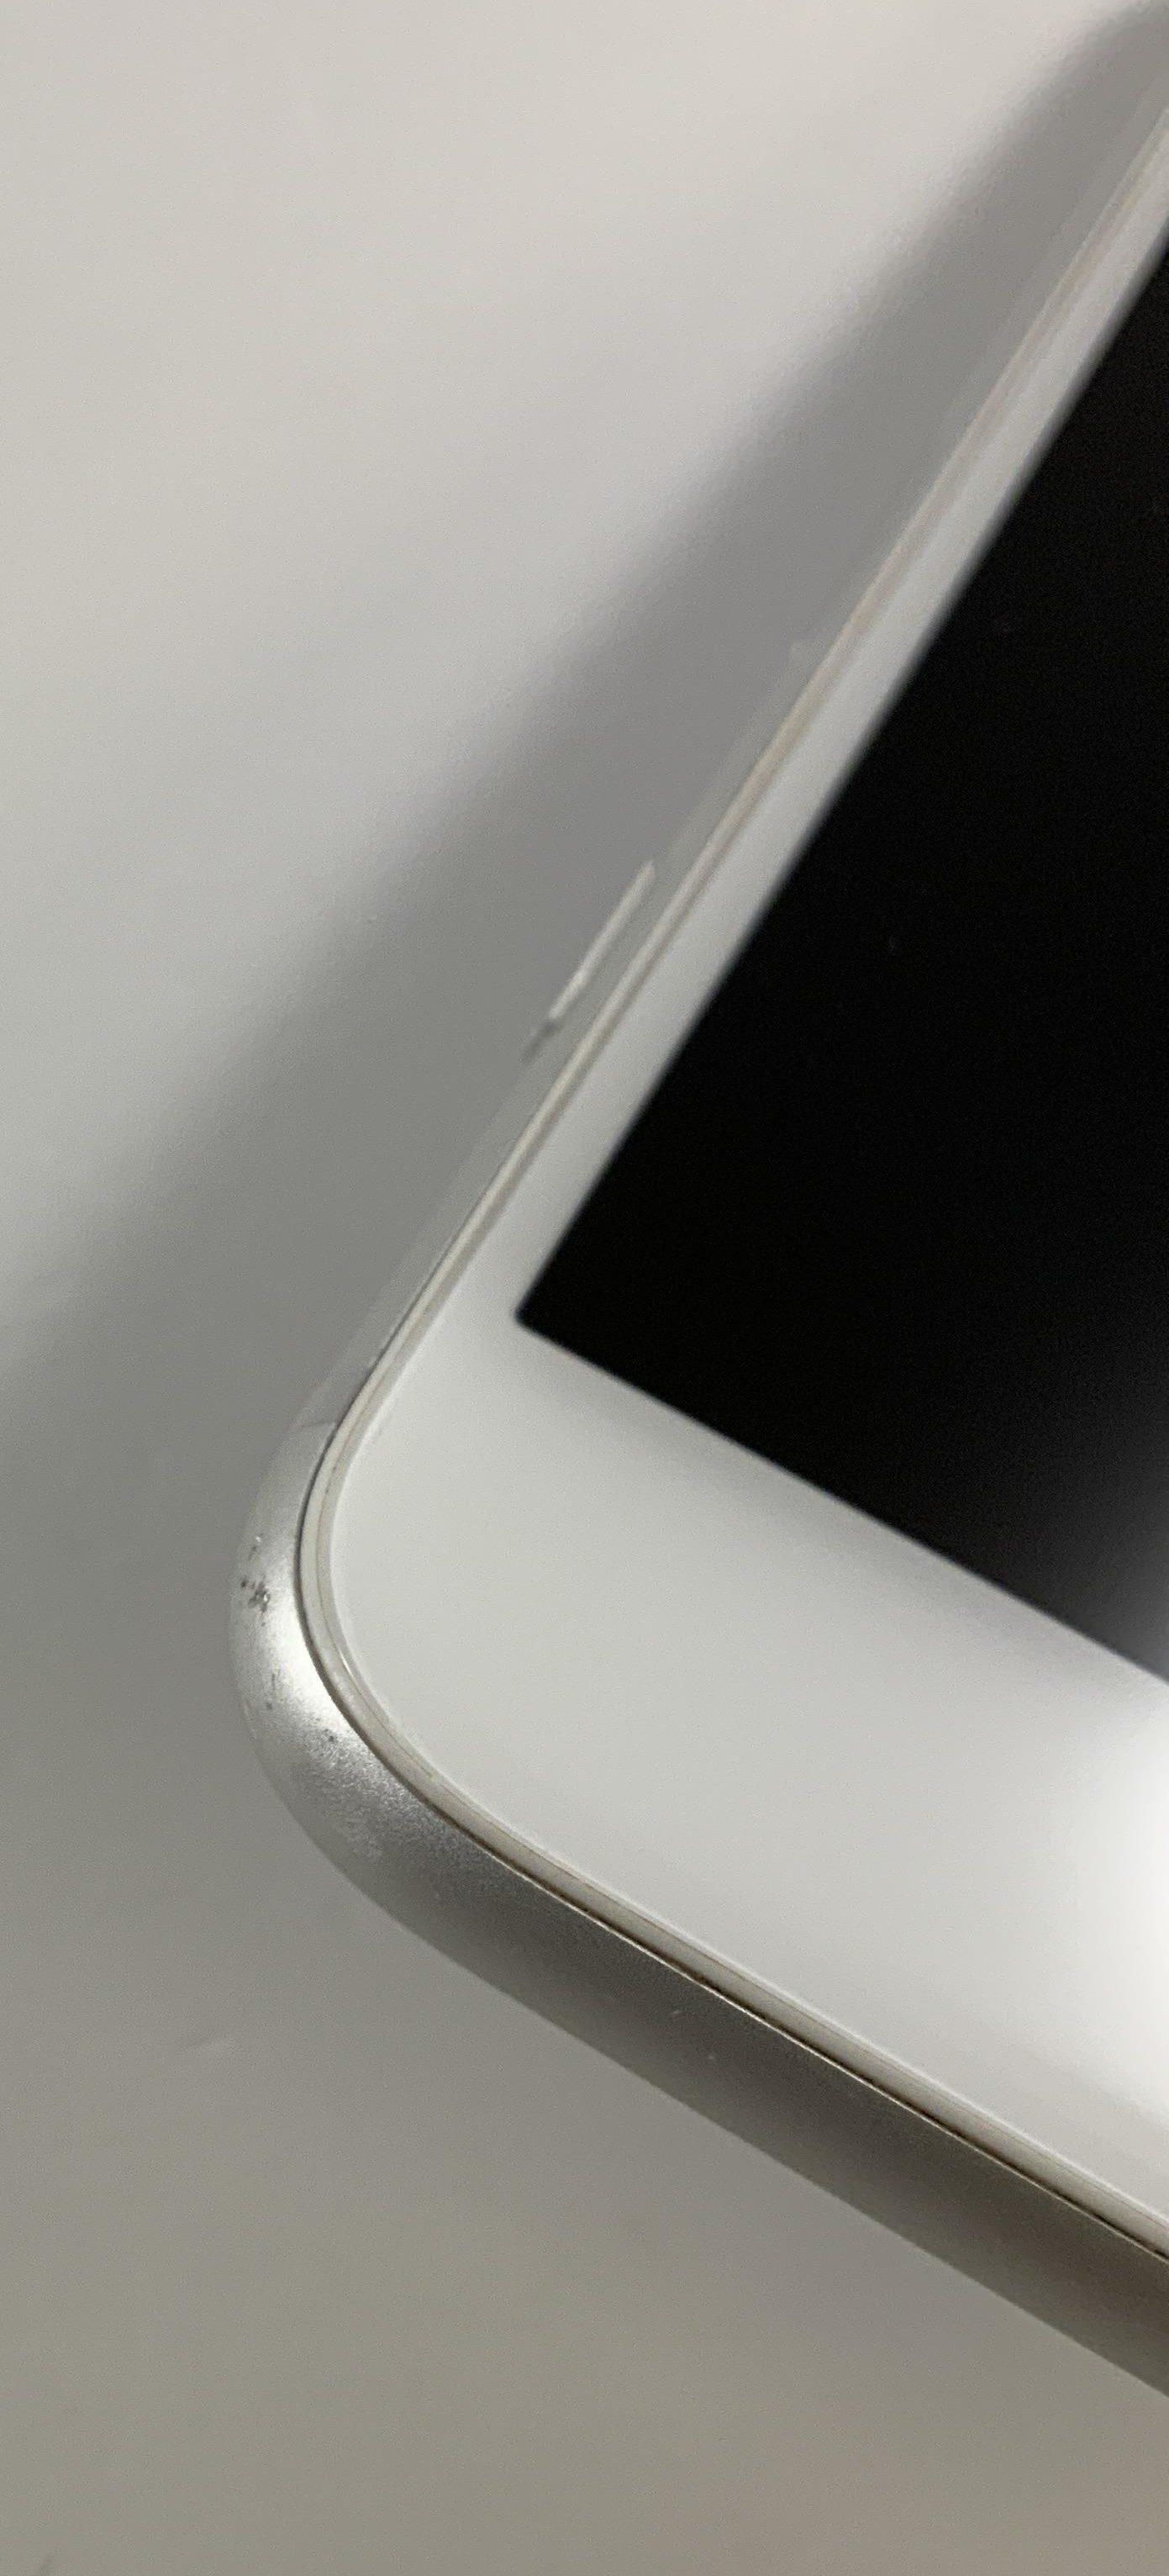 iPhone 7 32GB, 32GB, Silver, imagen 3